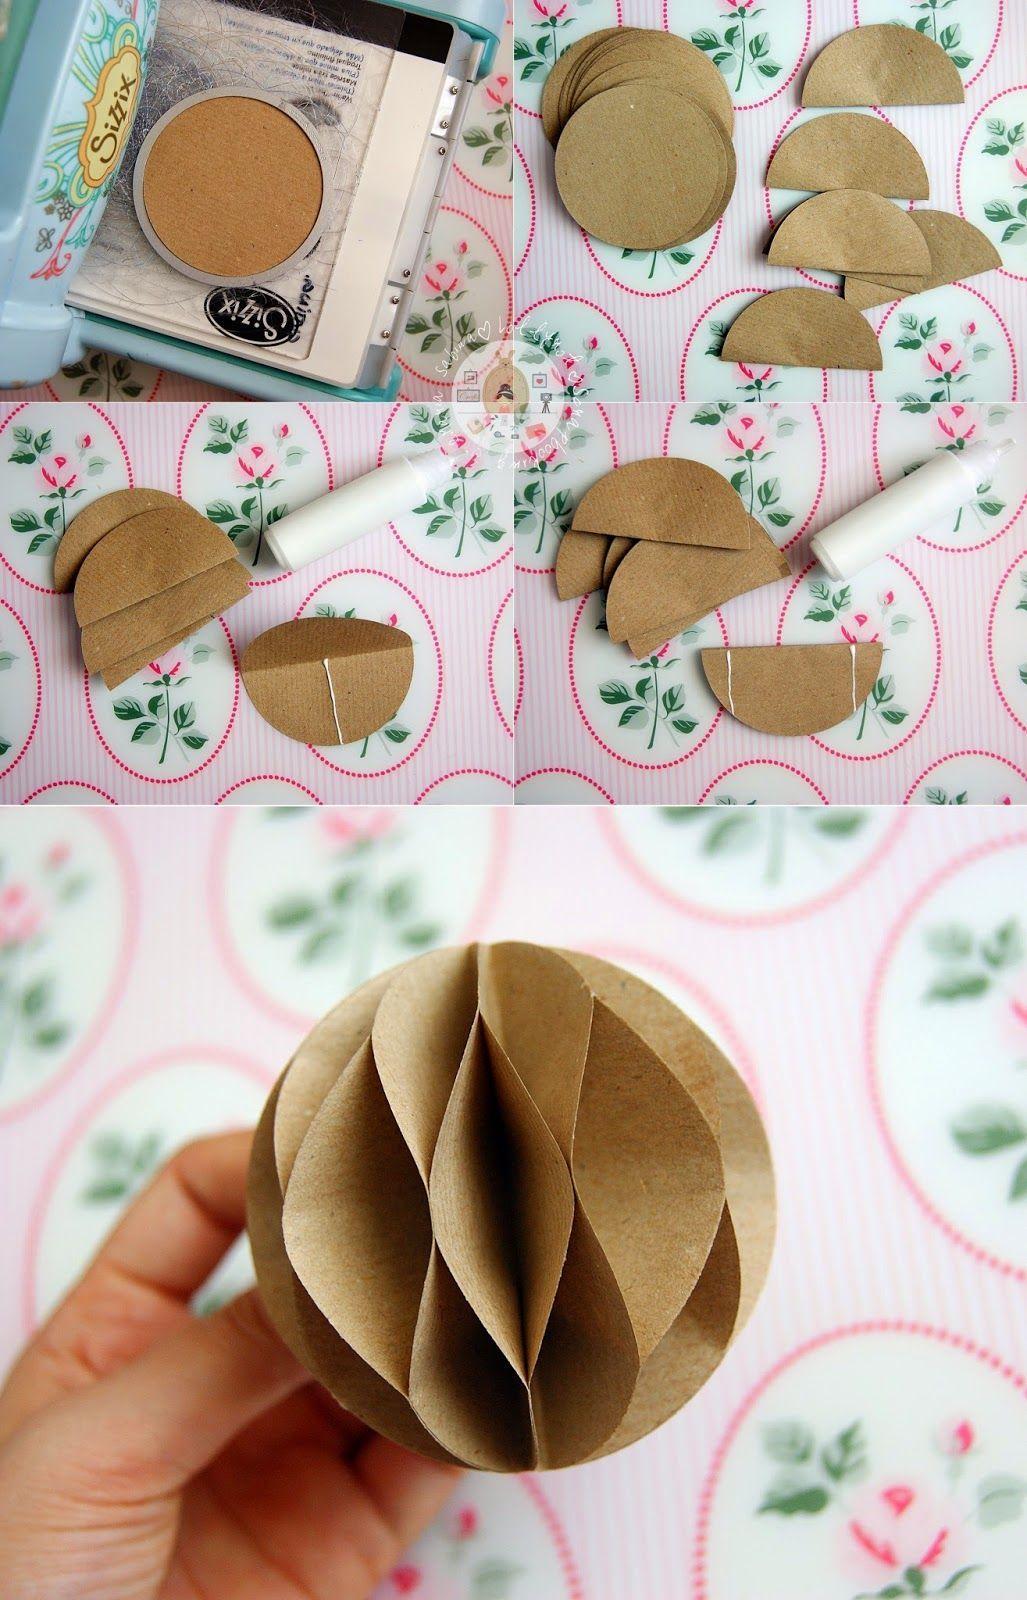 Lollyrot Scrapbooking Honeycomb Pom Poms Handmade Christmas Decorations Paper Ornaments Diy Christmas Crafts Diy